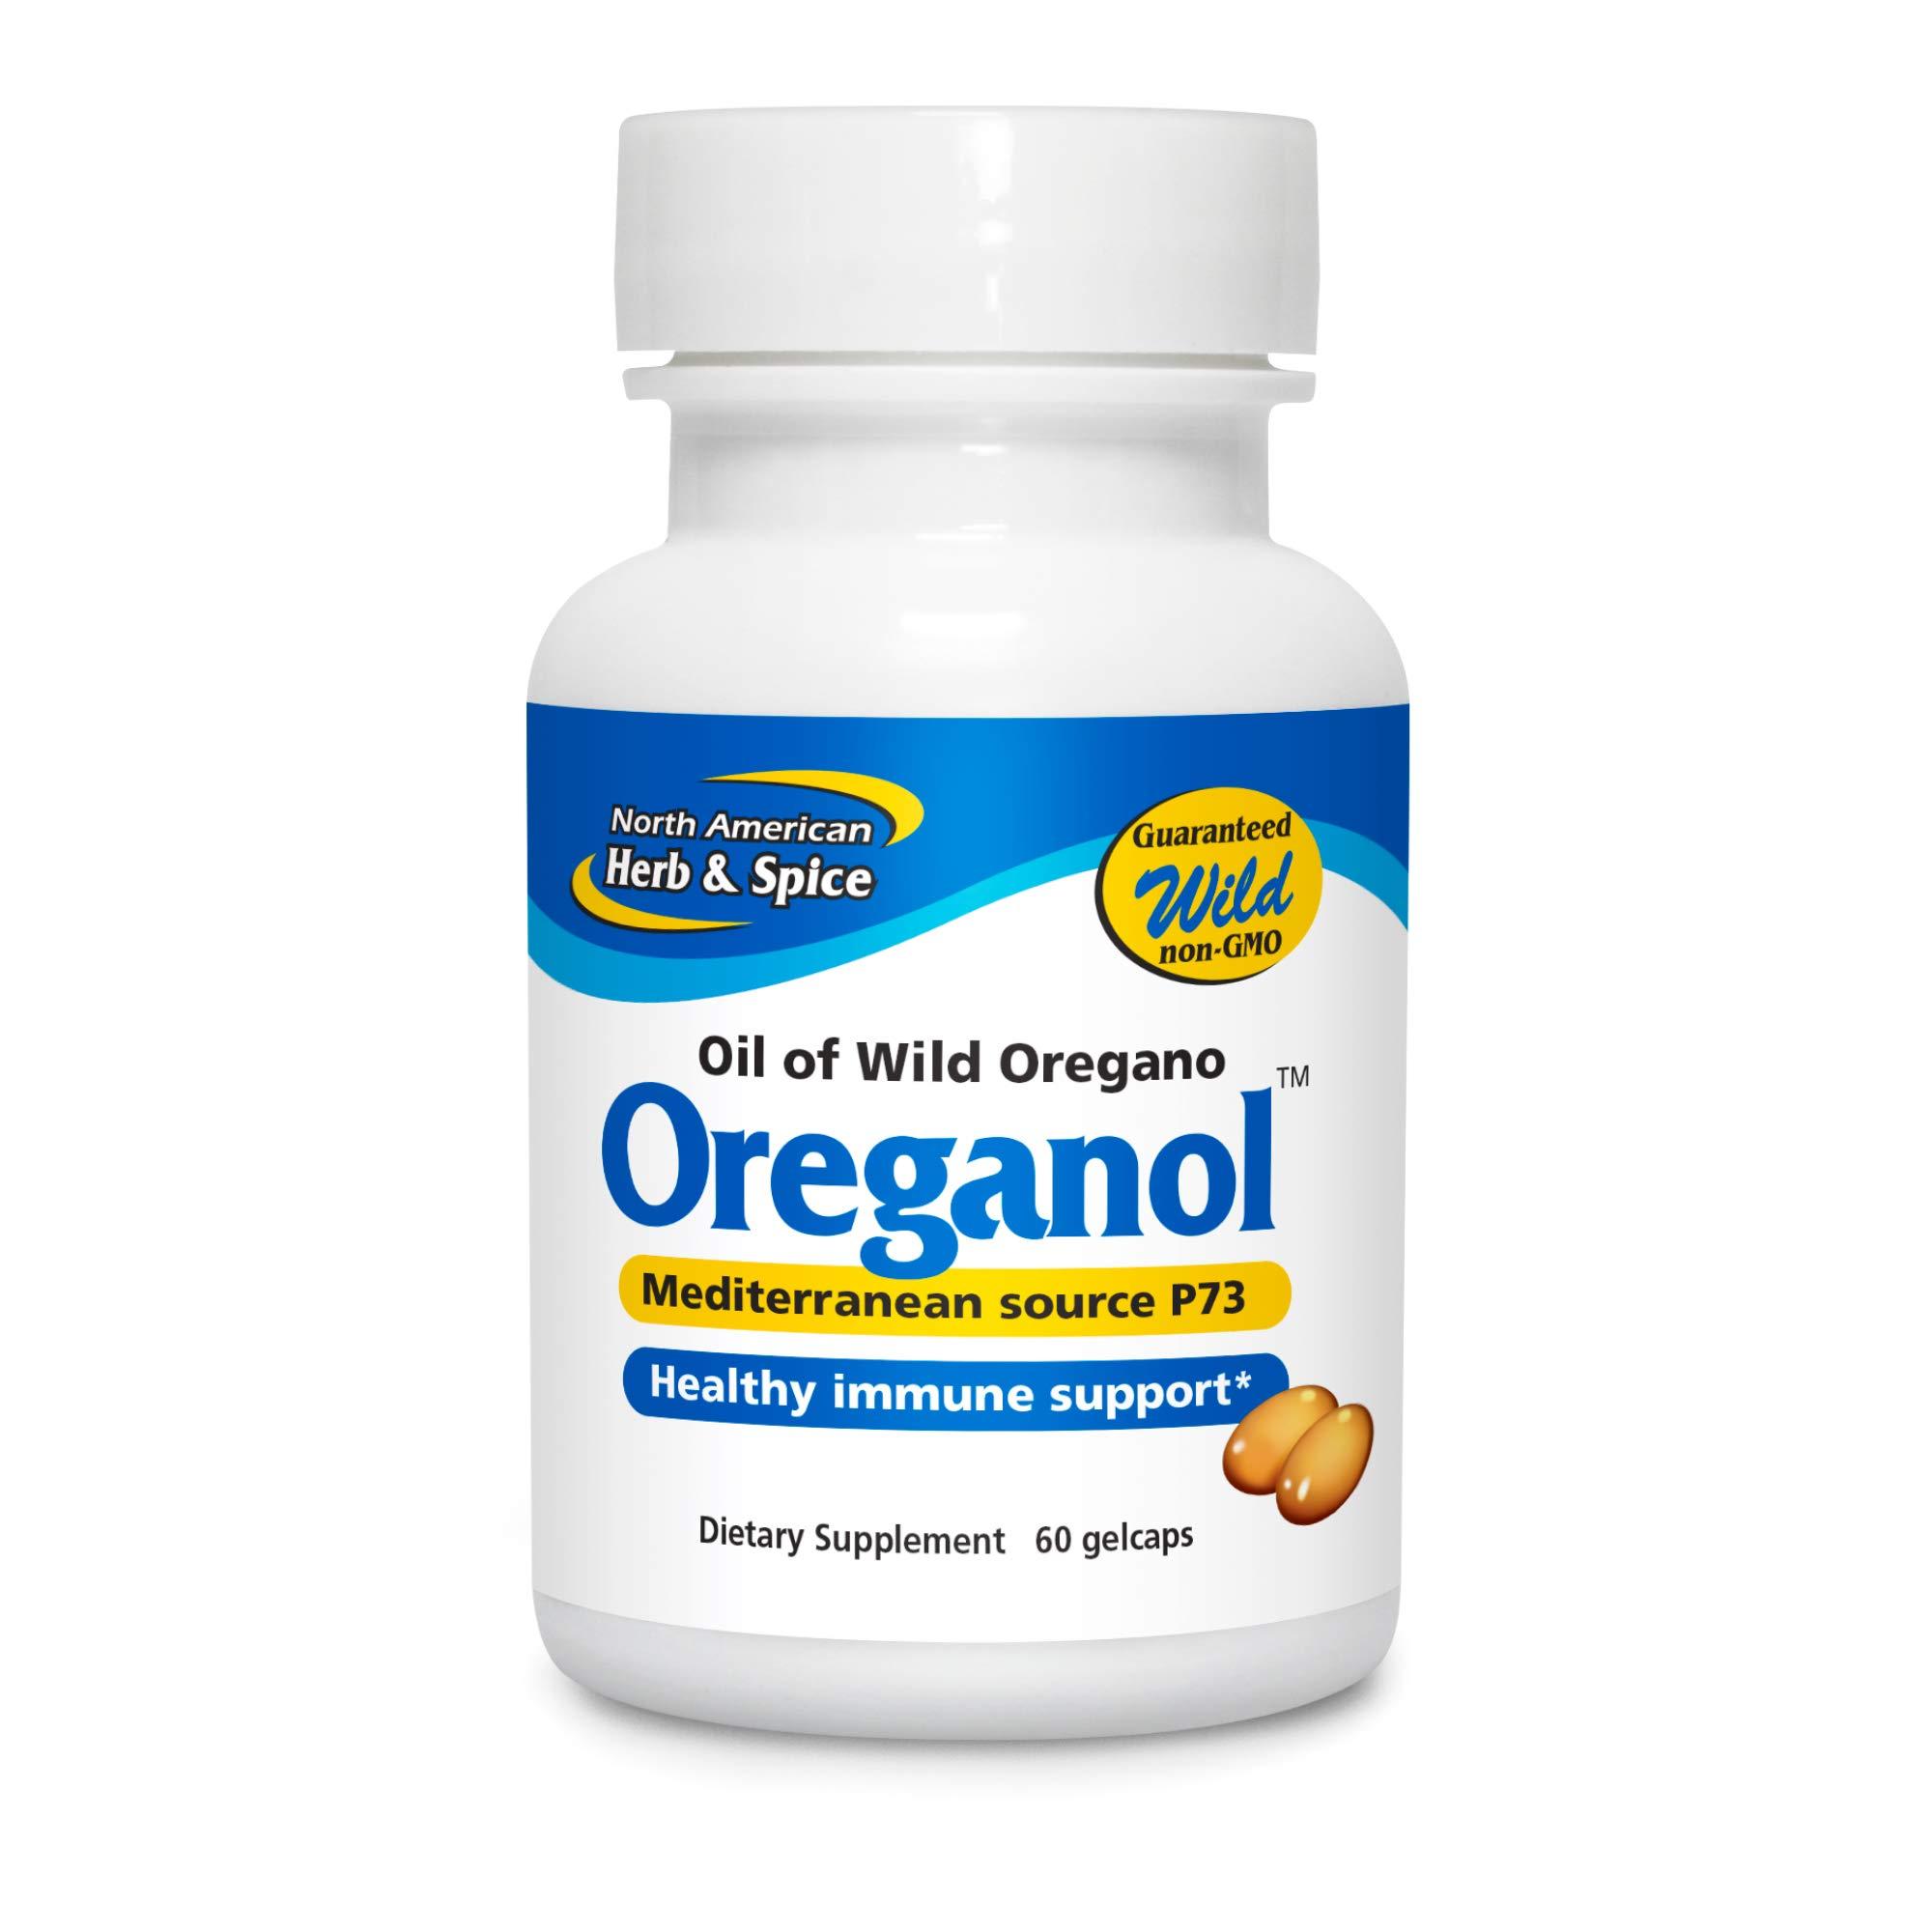 North American Herb & Spice Oreganol P73-60 Gelcaps - Immune System Support - Unprocessed, Vegan Friendly Wild Oregano - Mediterranean Source - Non-GMO - 60 Servings